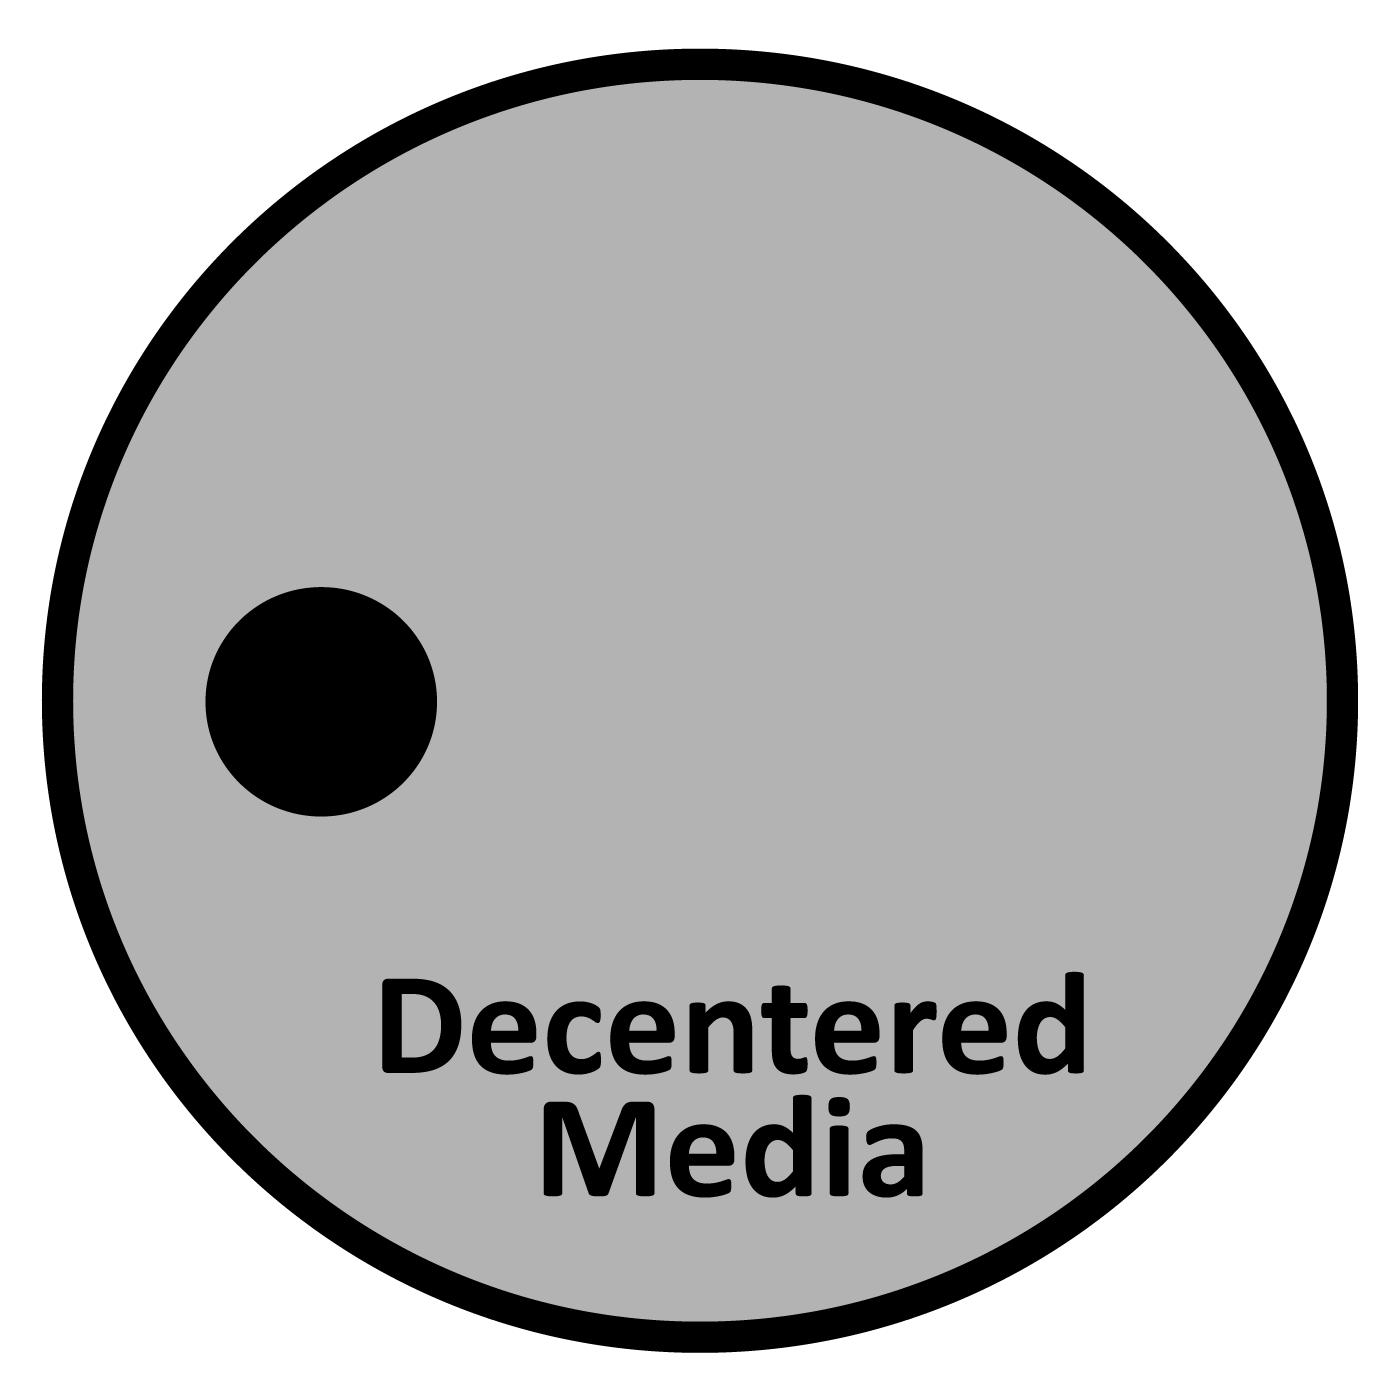 Decentered Media